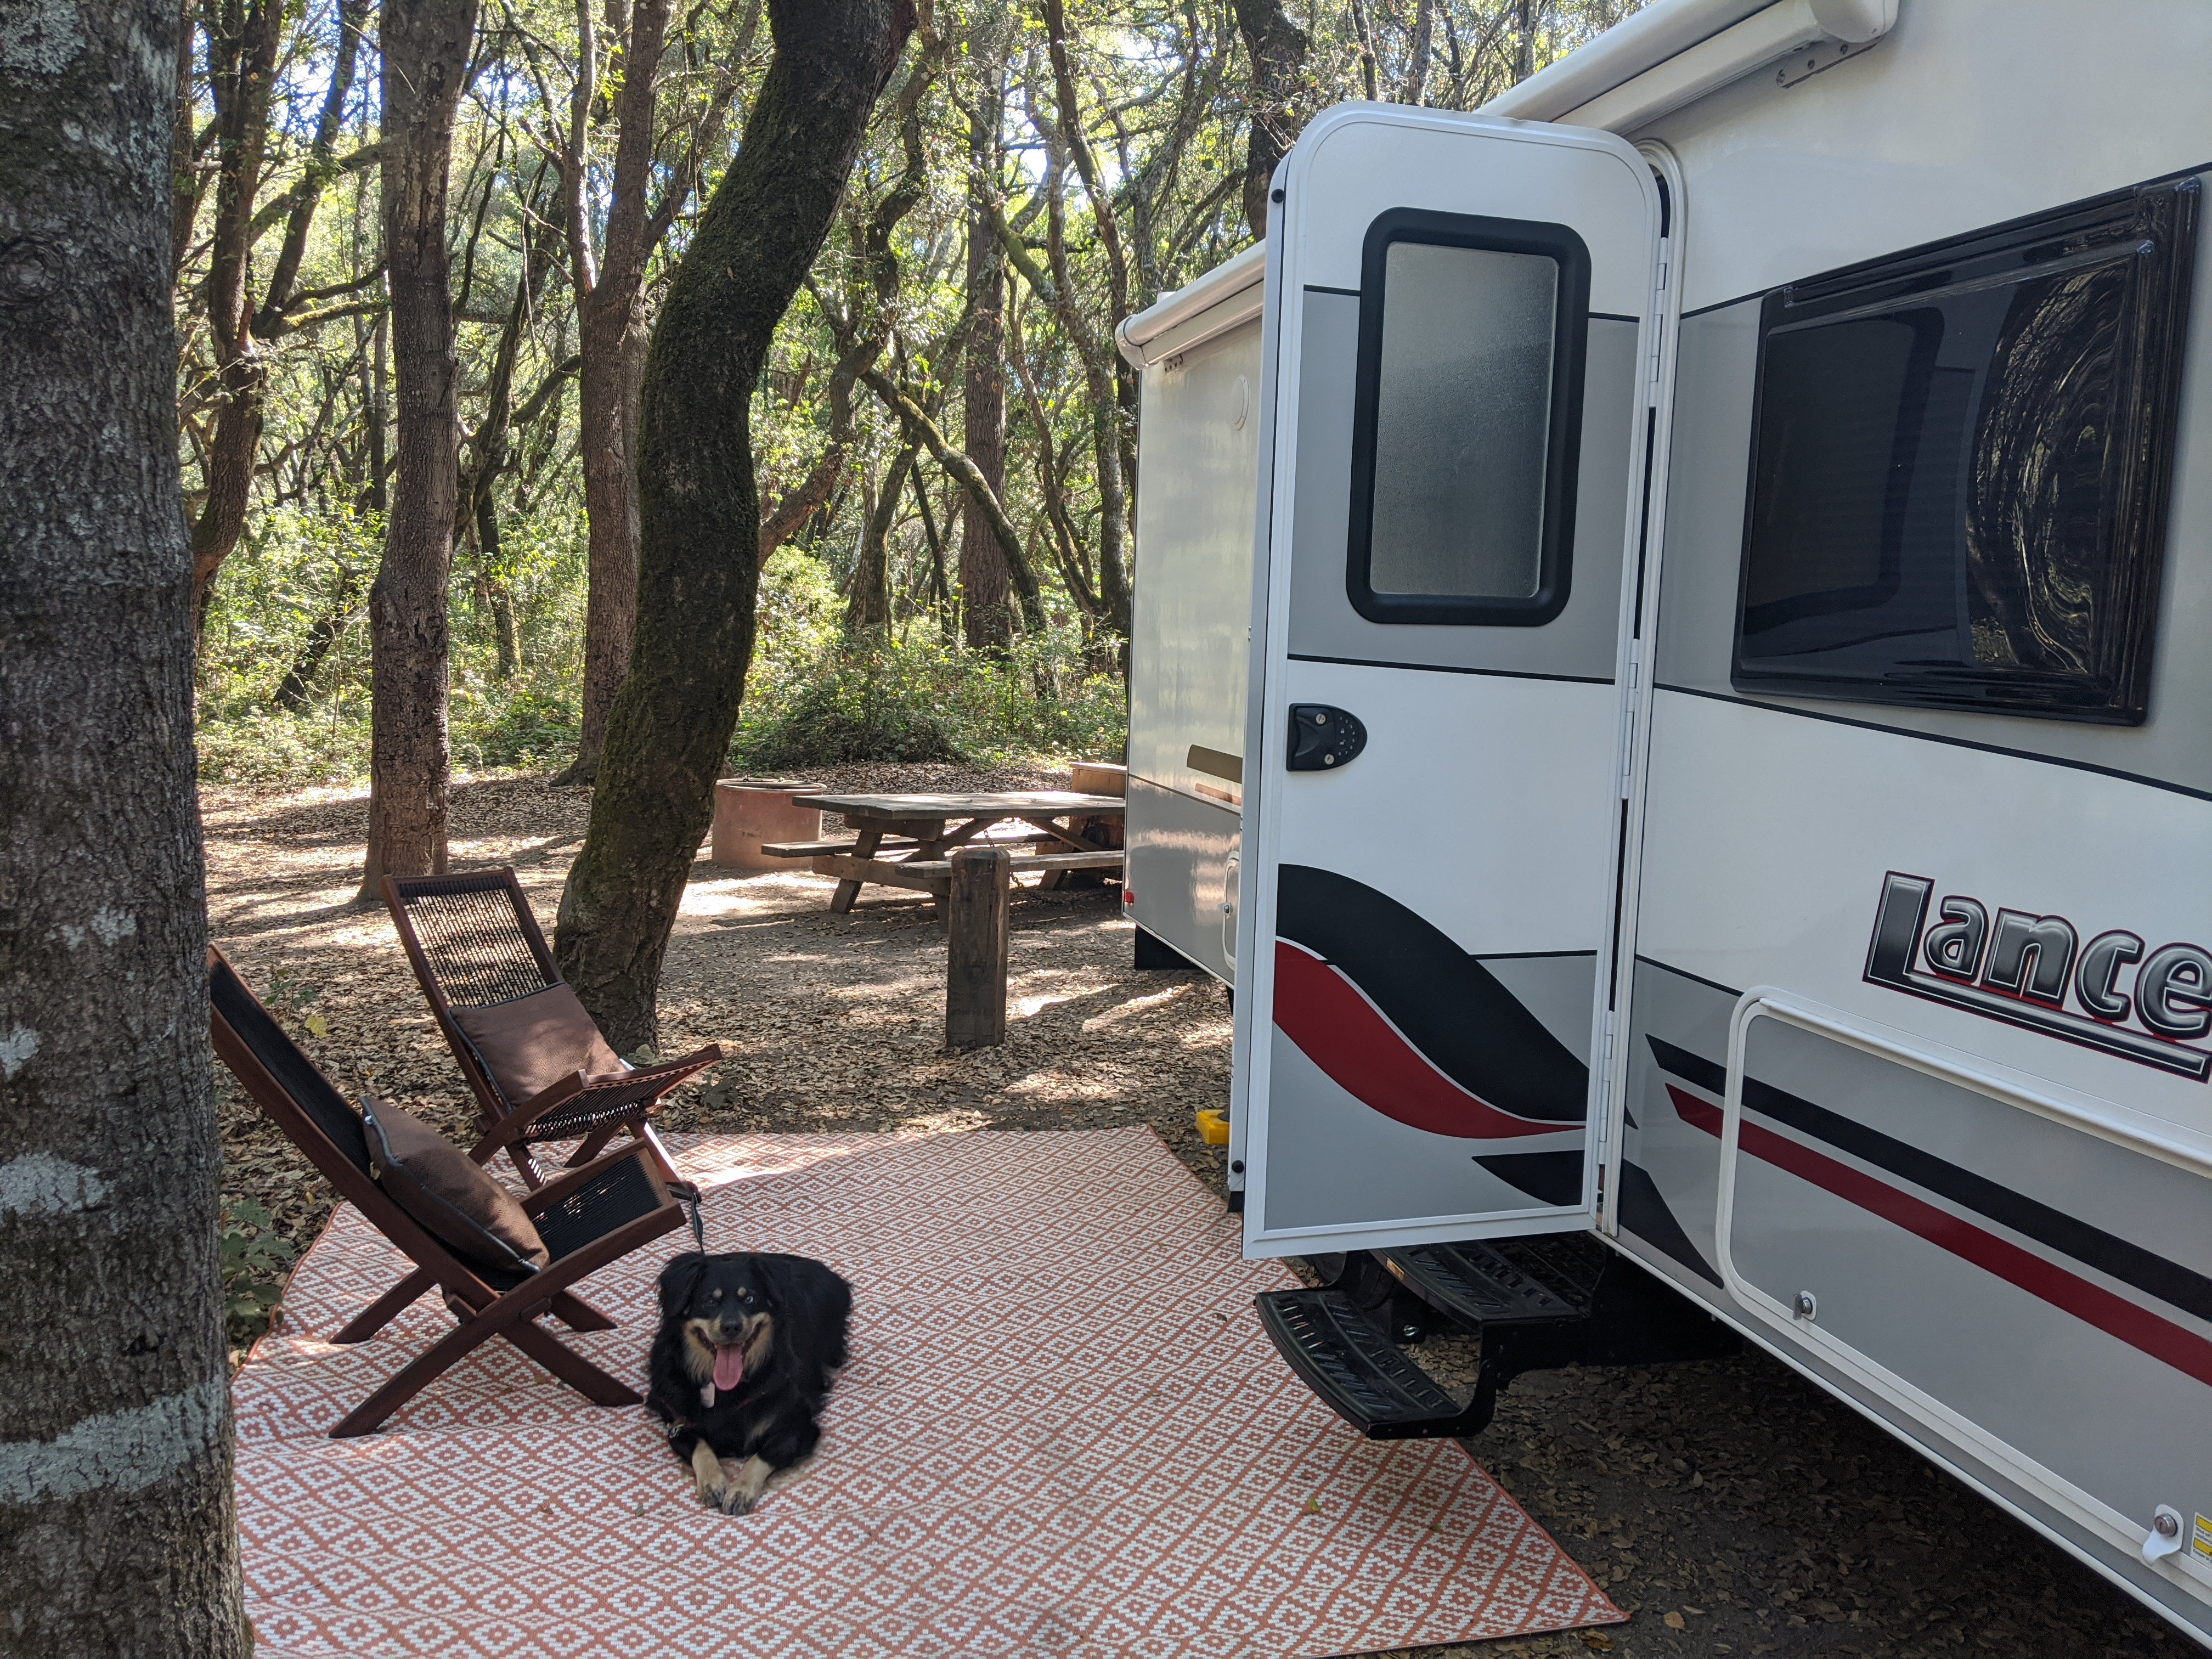 2020 Lance 1575 Trailer Rental in Clayton, CA | Outdoorsy